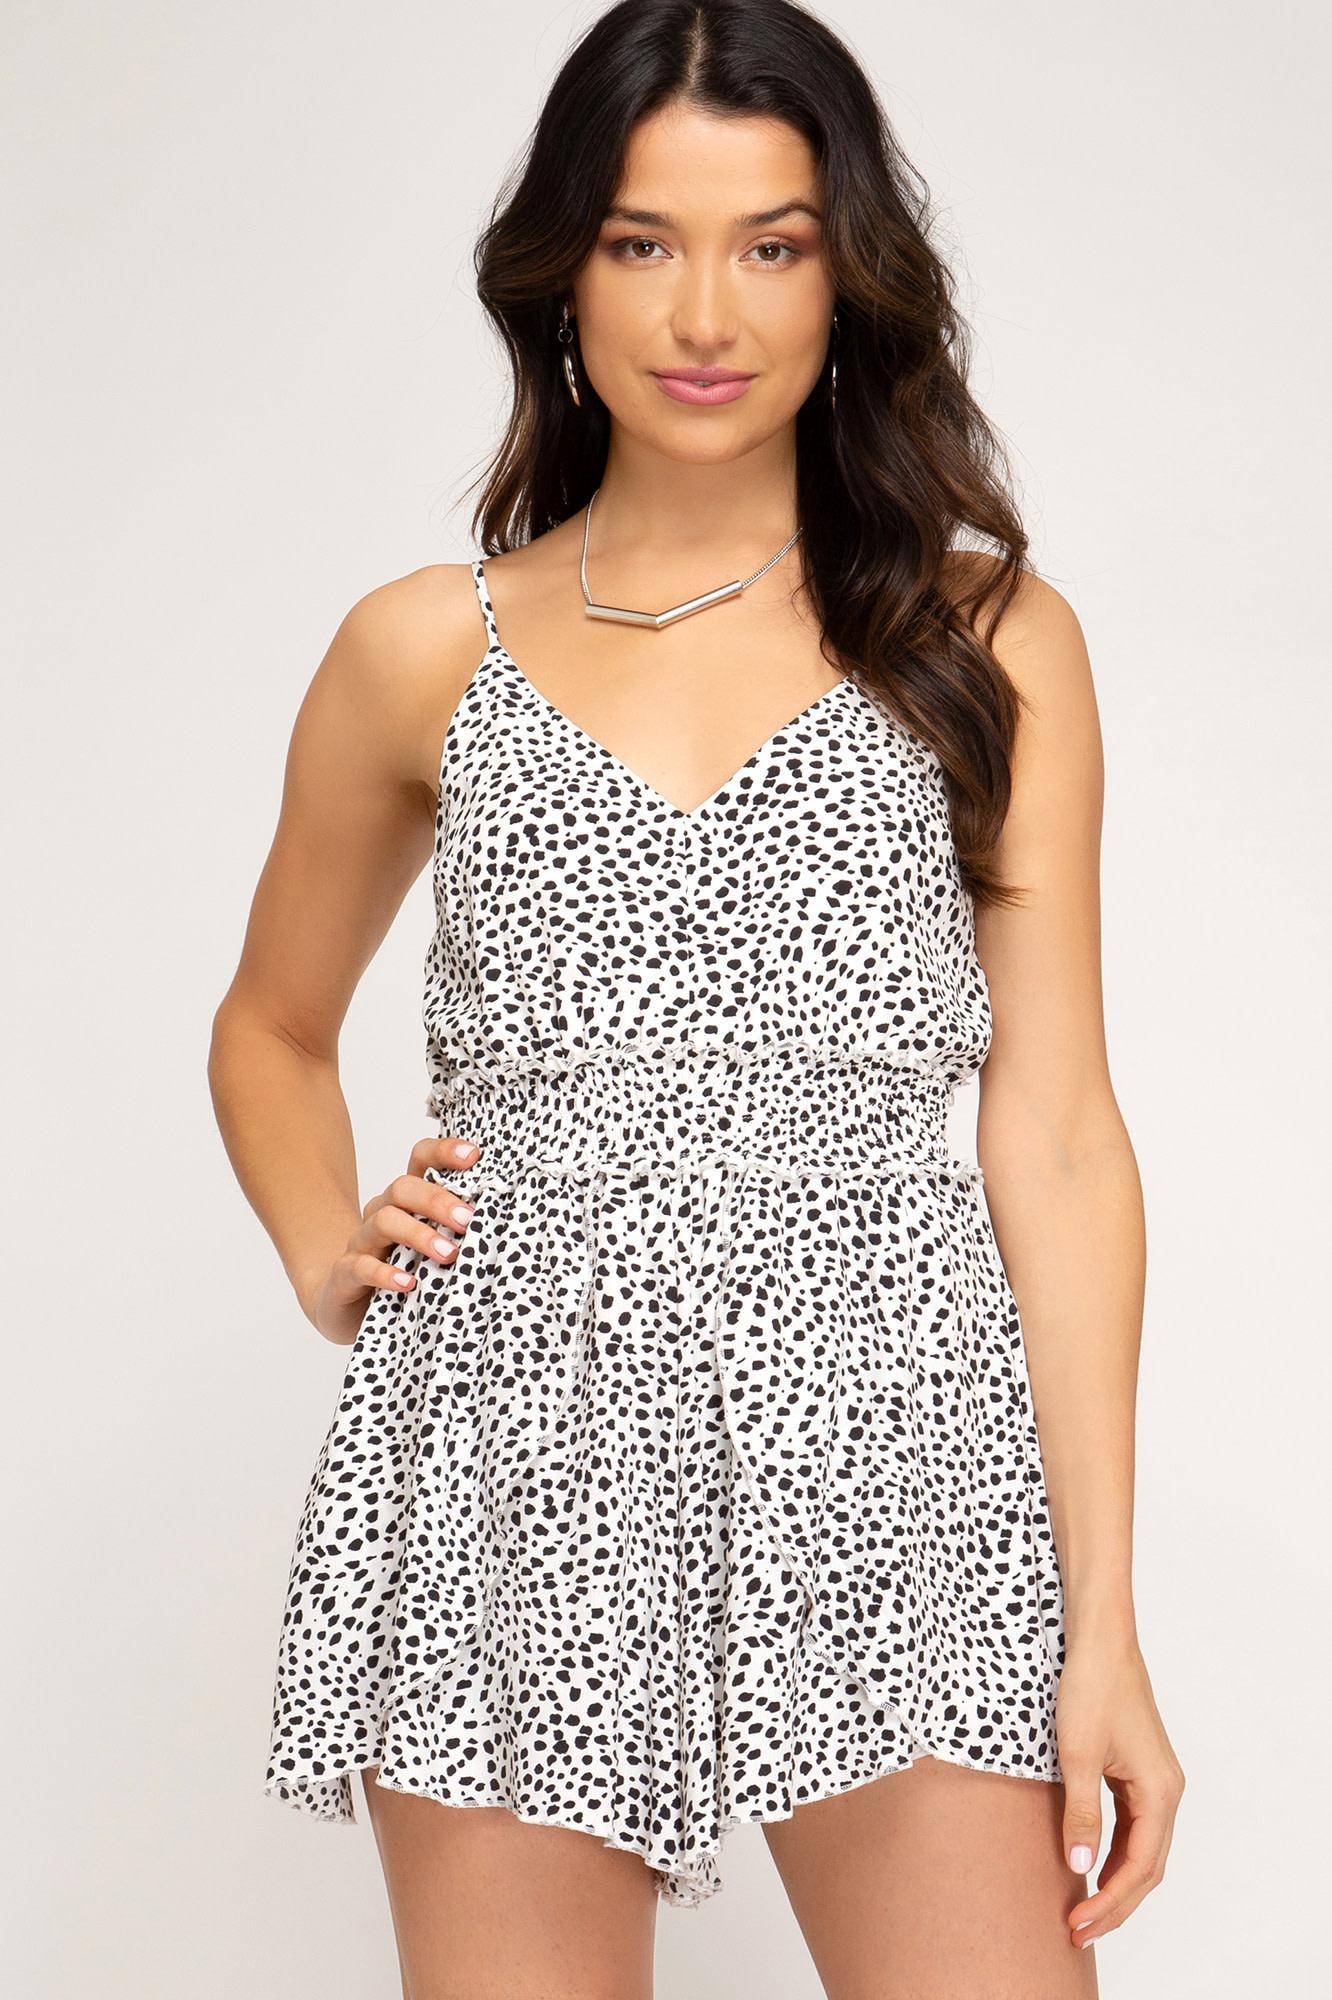 White & black print romper w/smocked waist